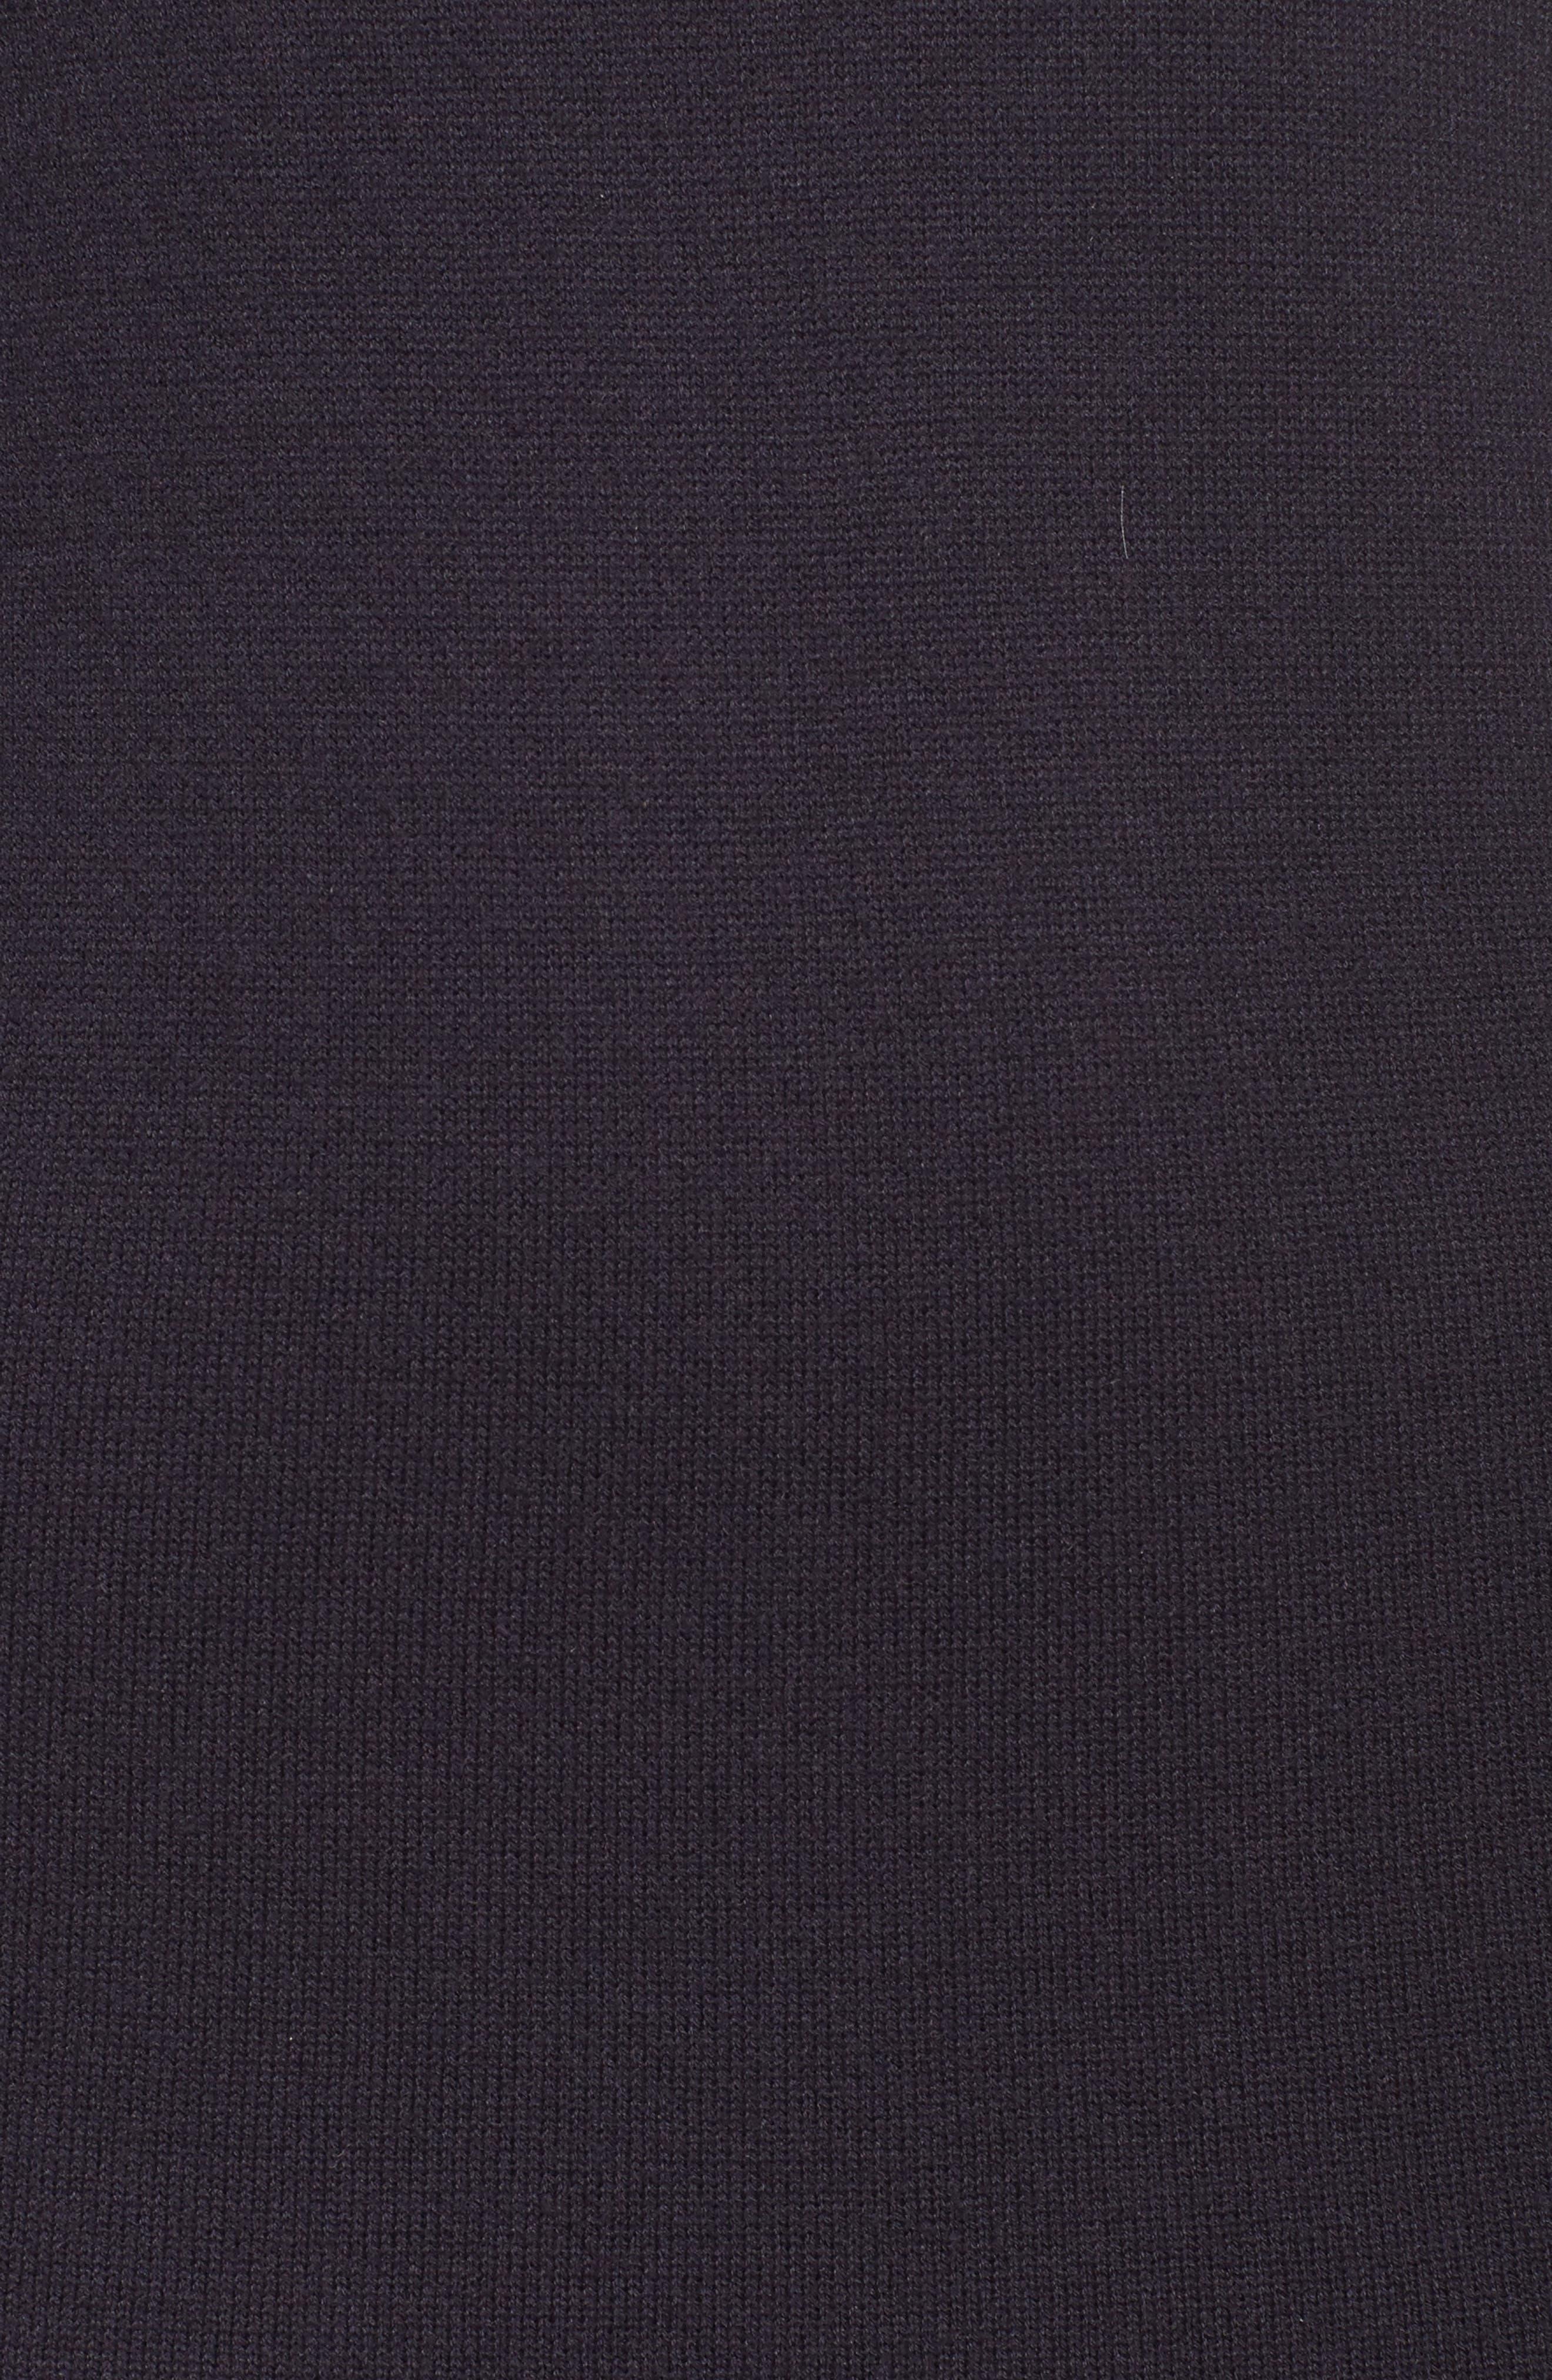 Bell Sleeve Sweater Dress,                             Alternate thumbnail 5, color,                             400